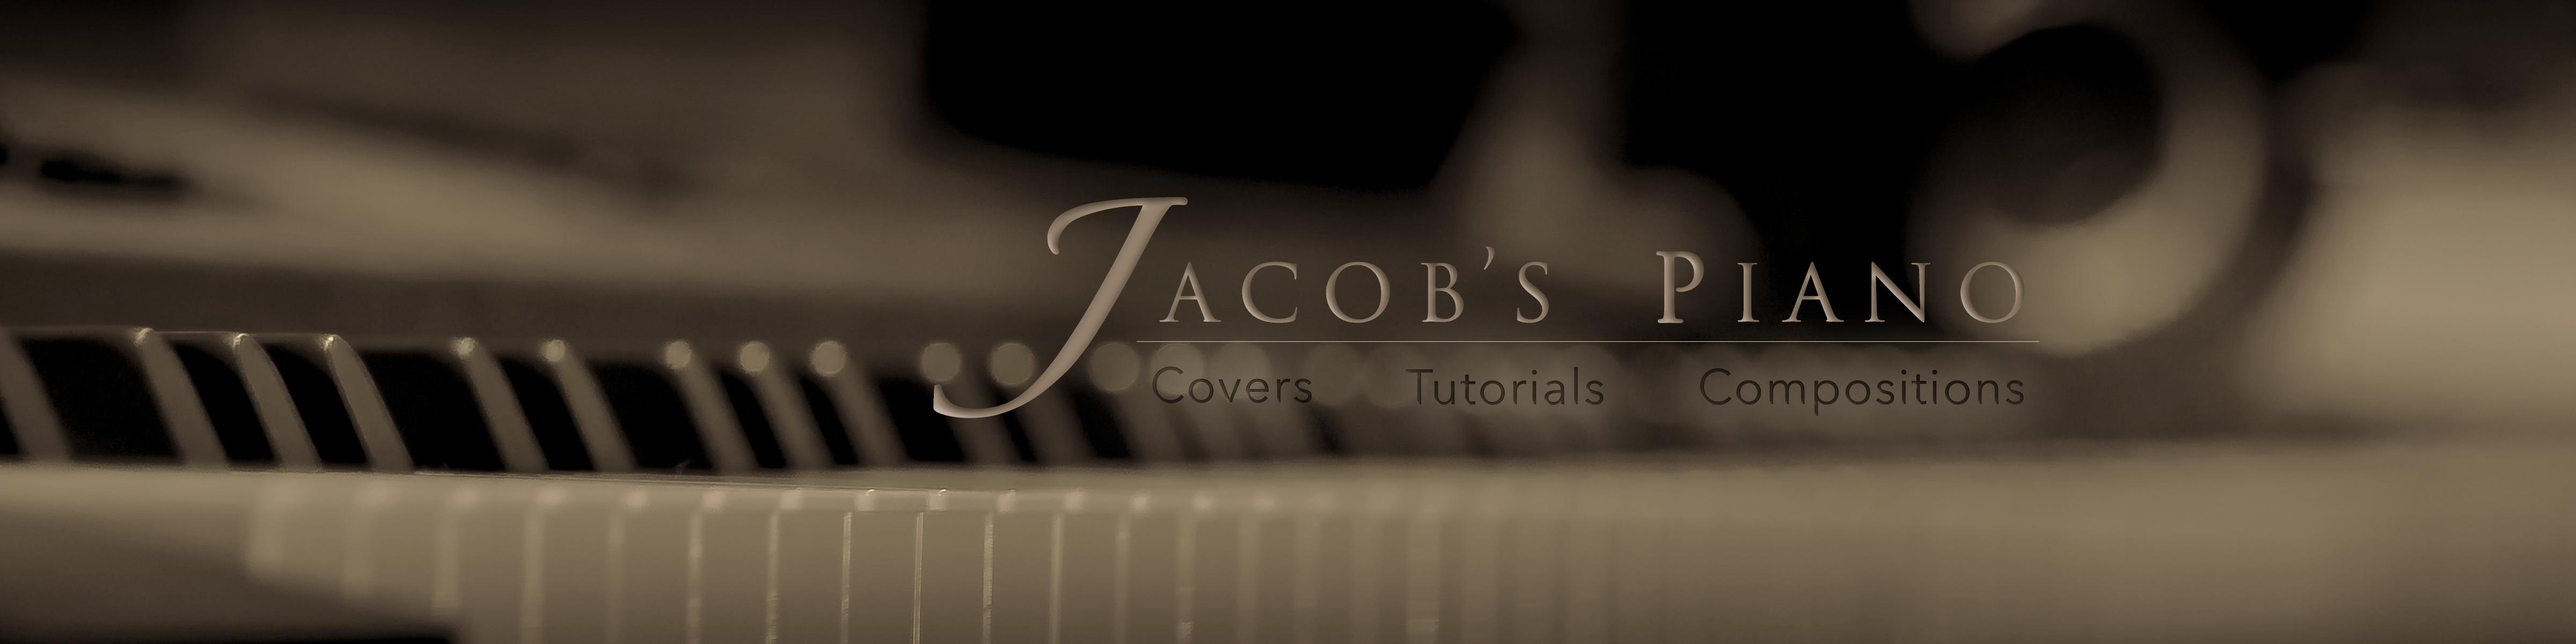 Downloads - Jacob's Piano